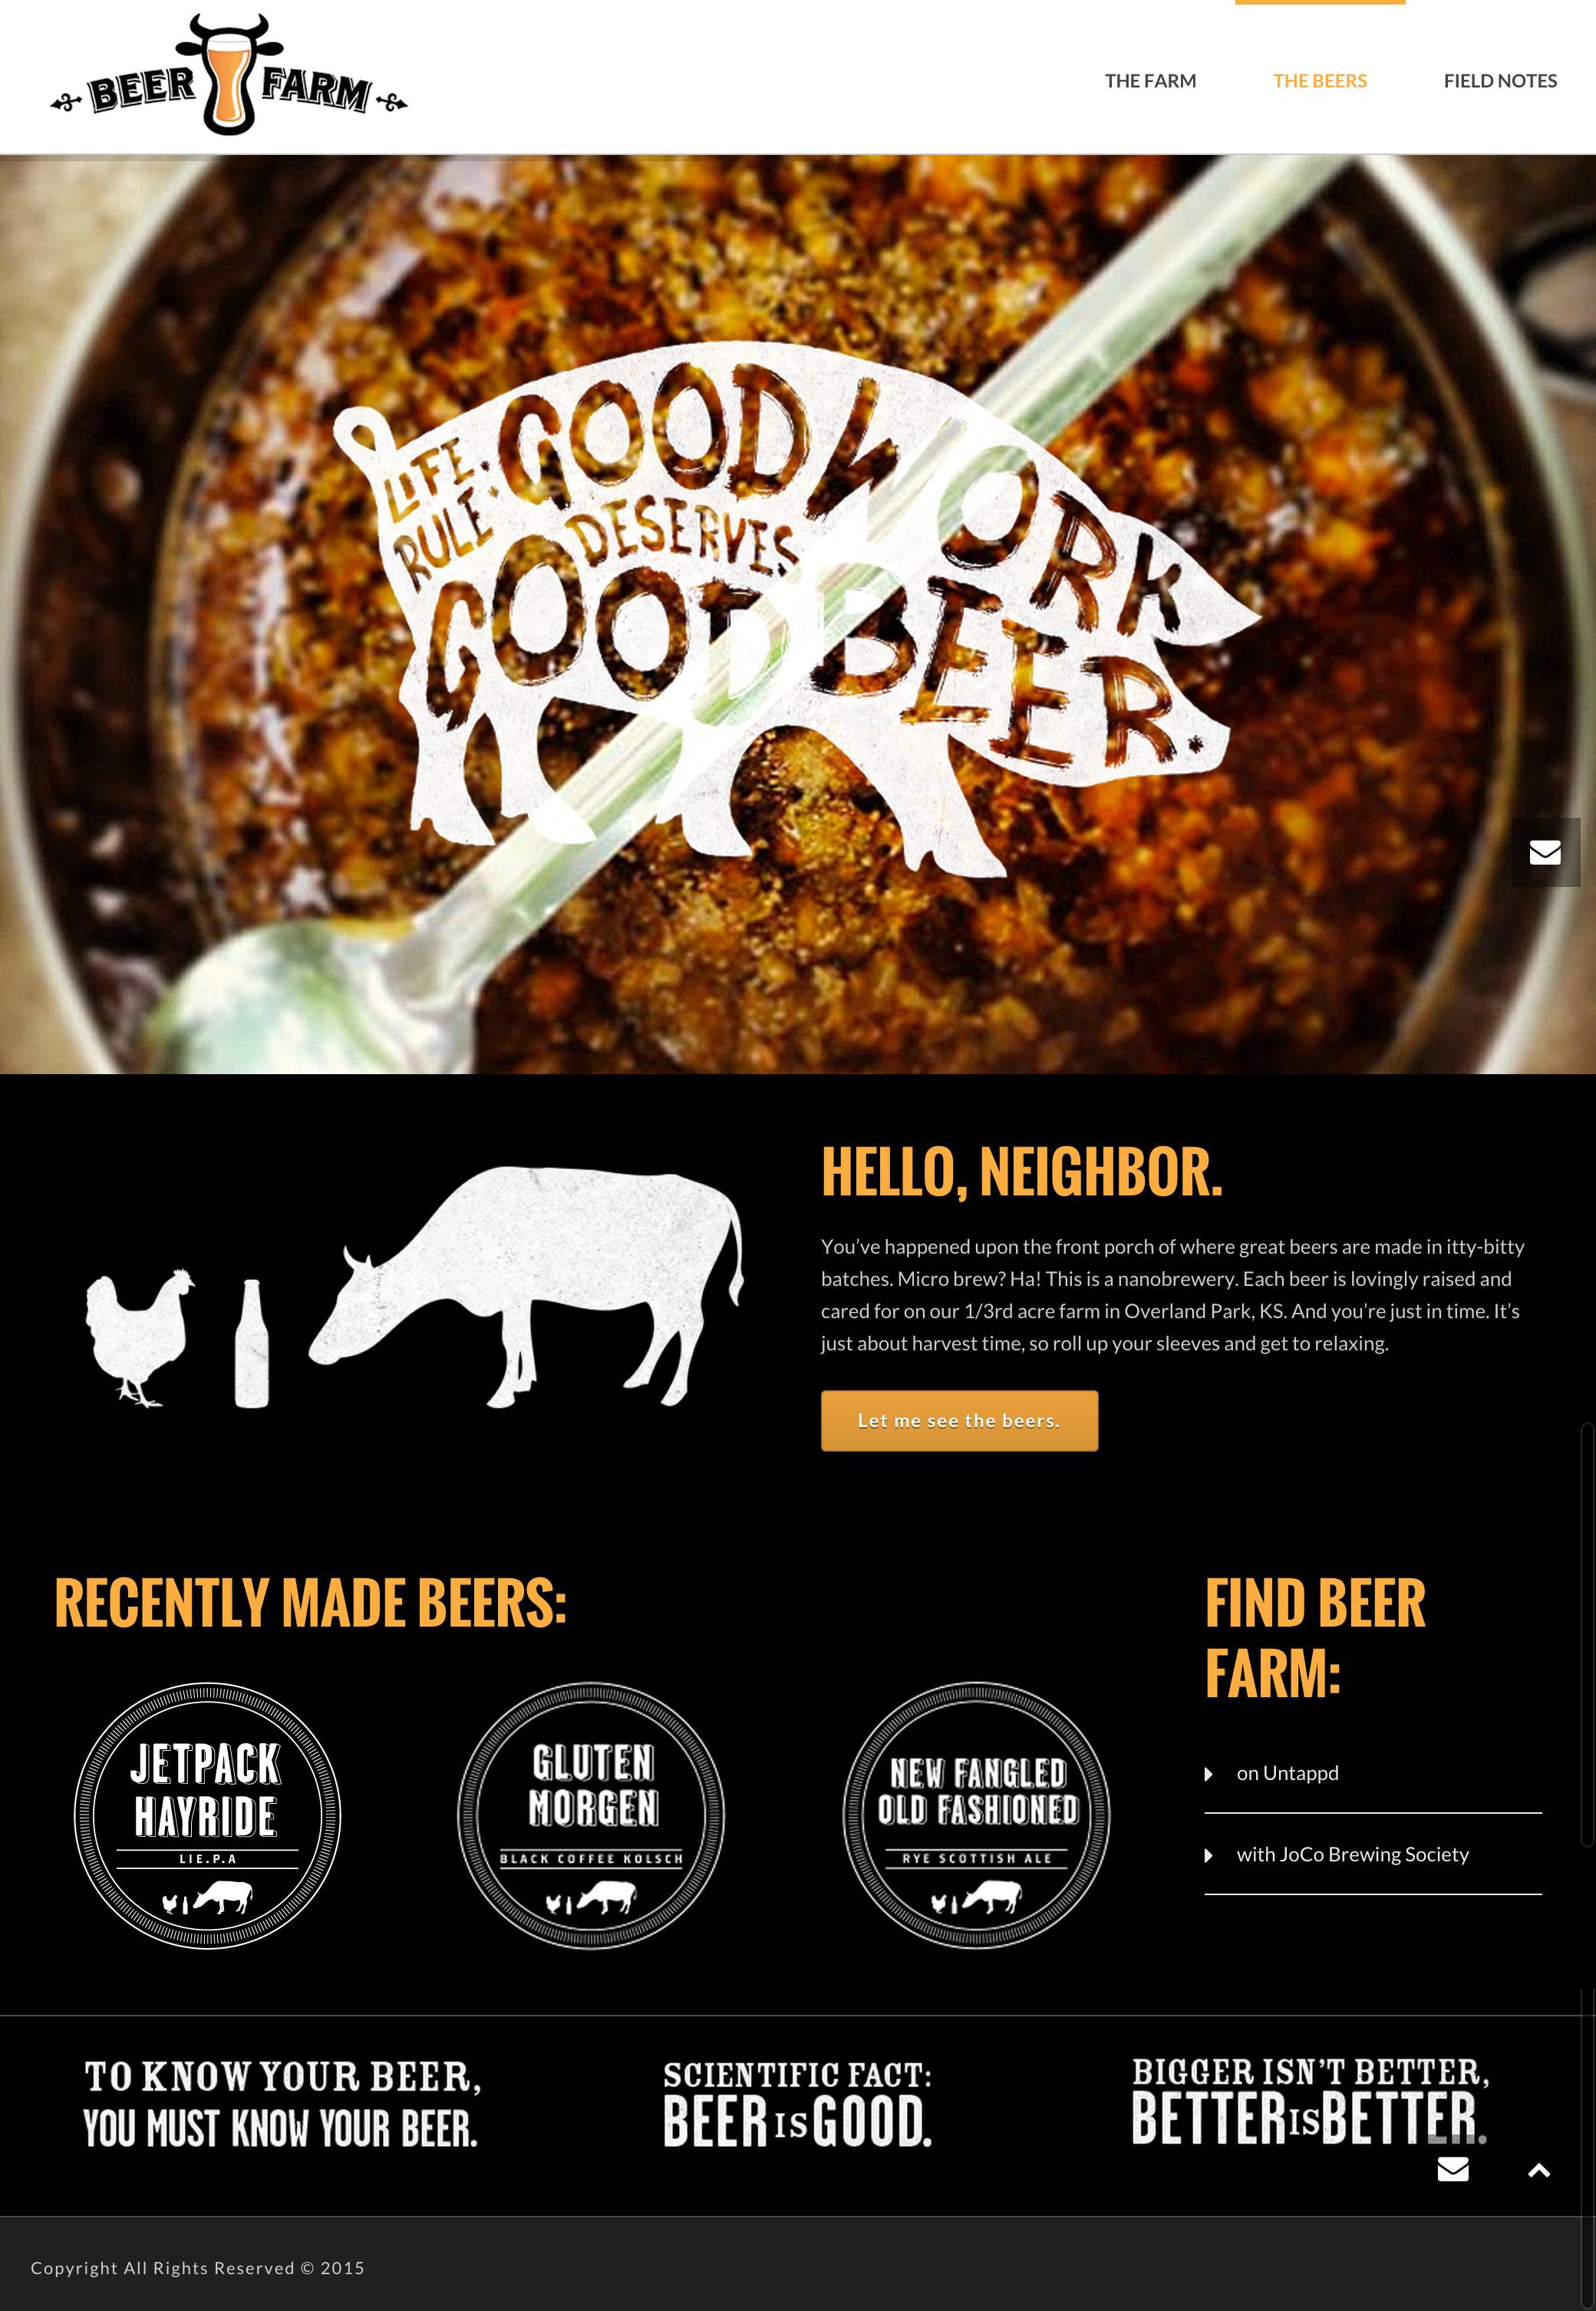 BeerFarm-Home